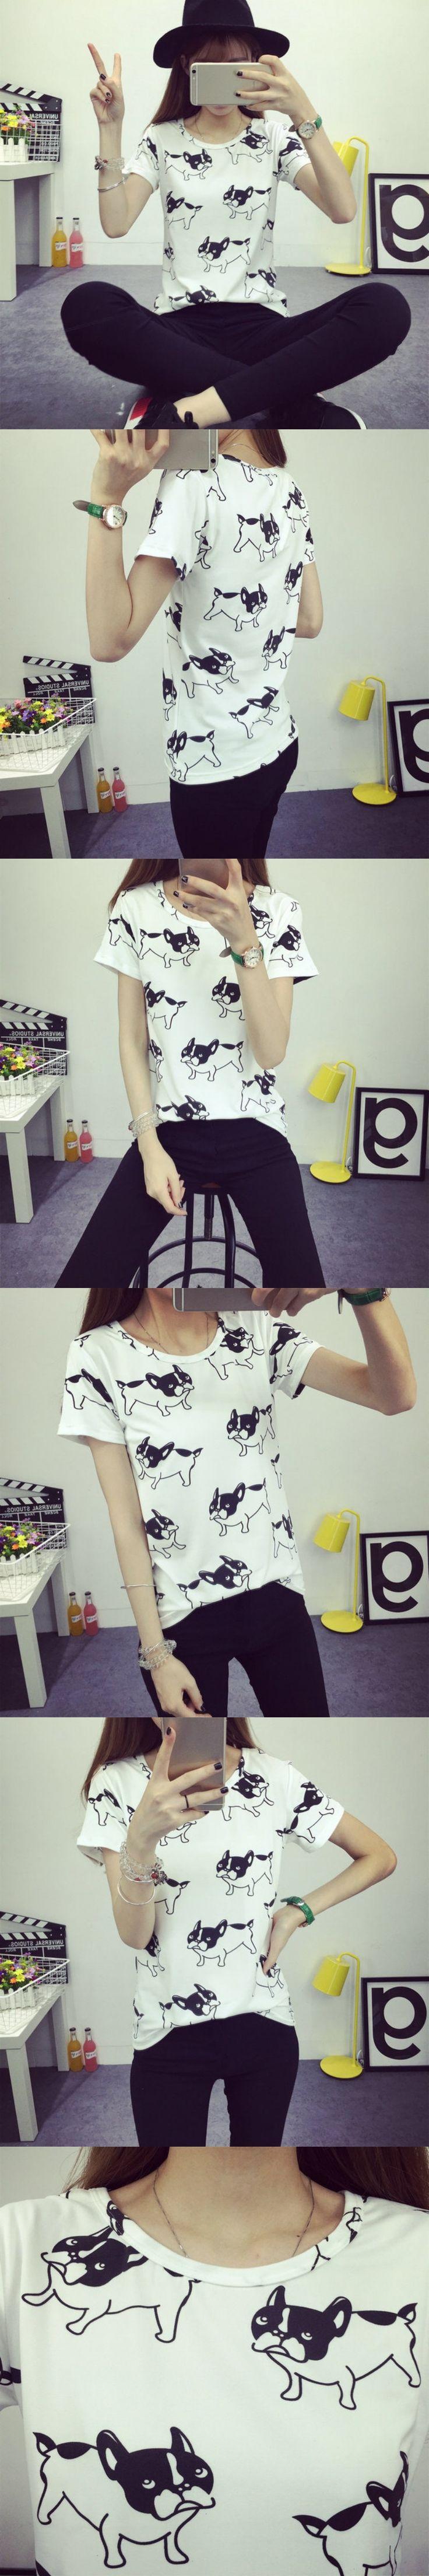 Summer New Fashion T-shirts Women Cute Dog Printed Tee Shirt Camisas Femininas 2016 Poleras De Mujer Femme Tshirt Tops  V2